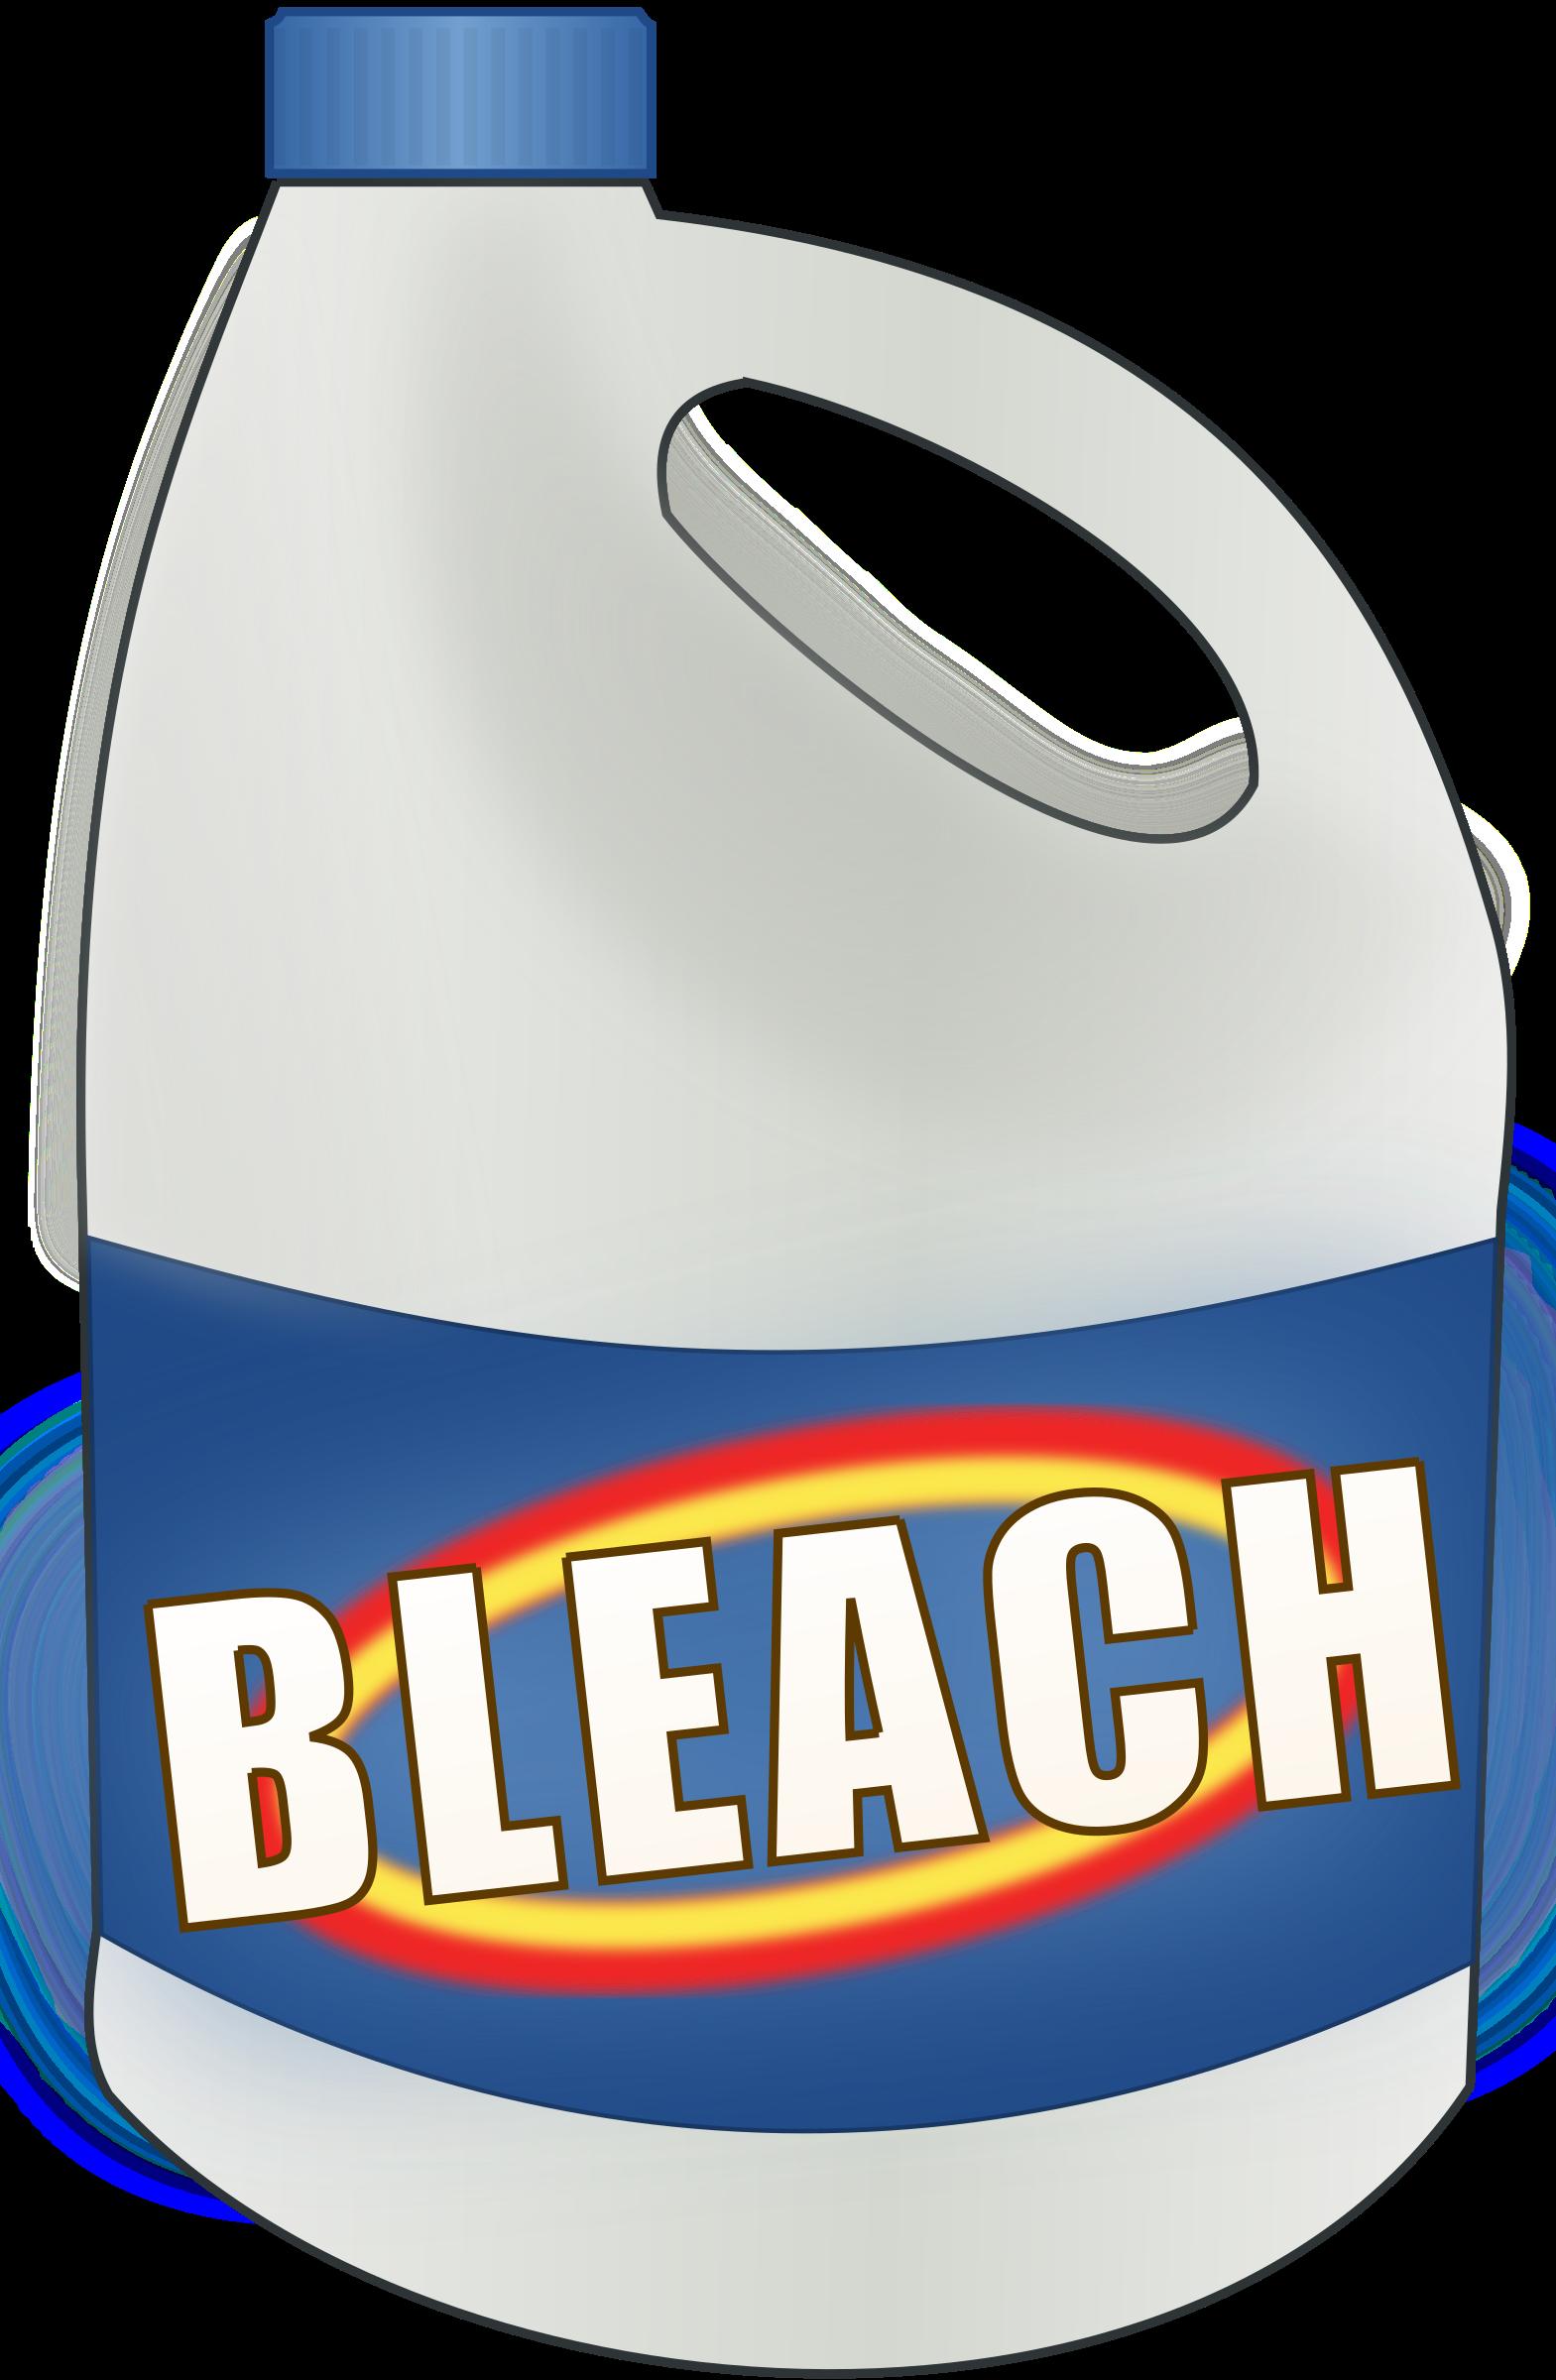 Clipart big image. Bleach bottle png